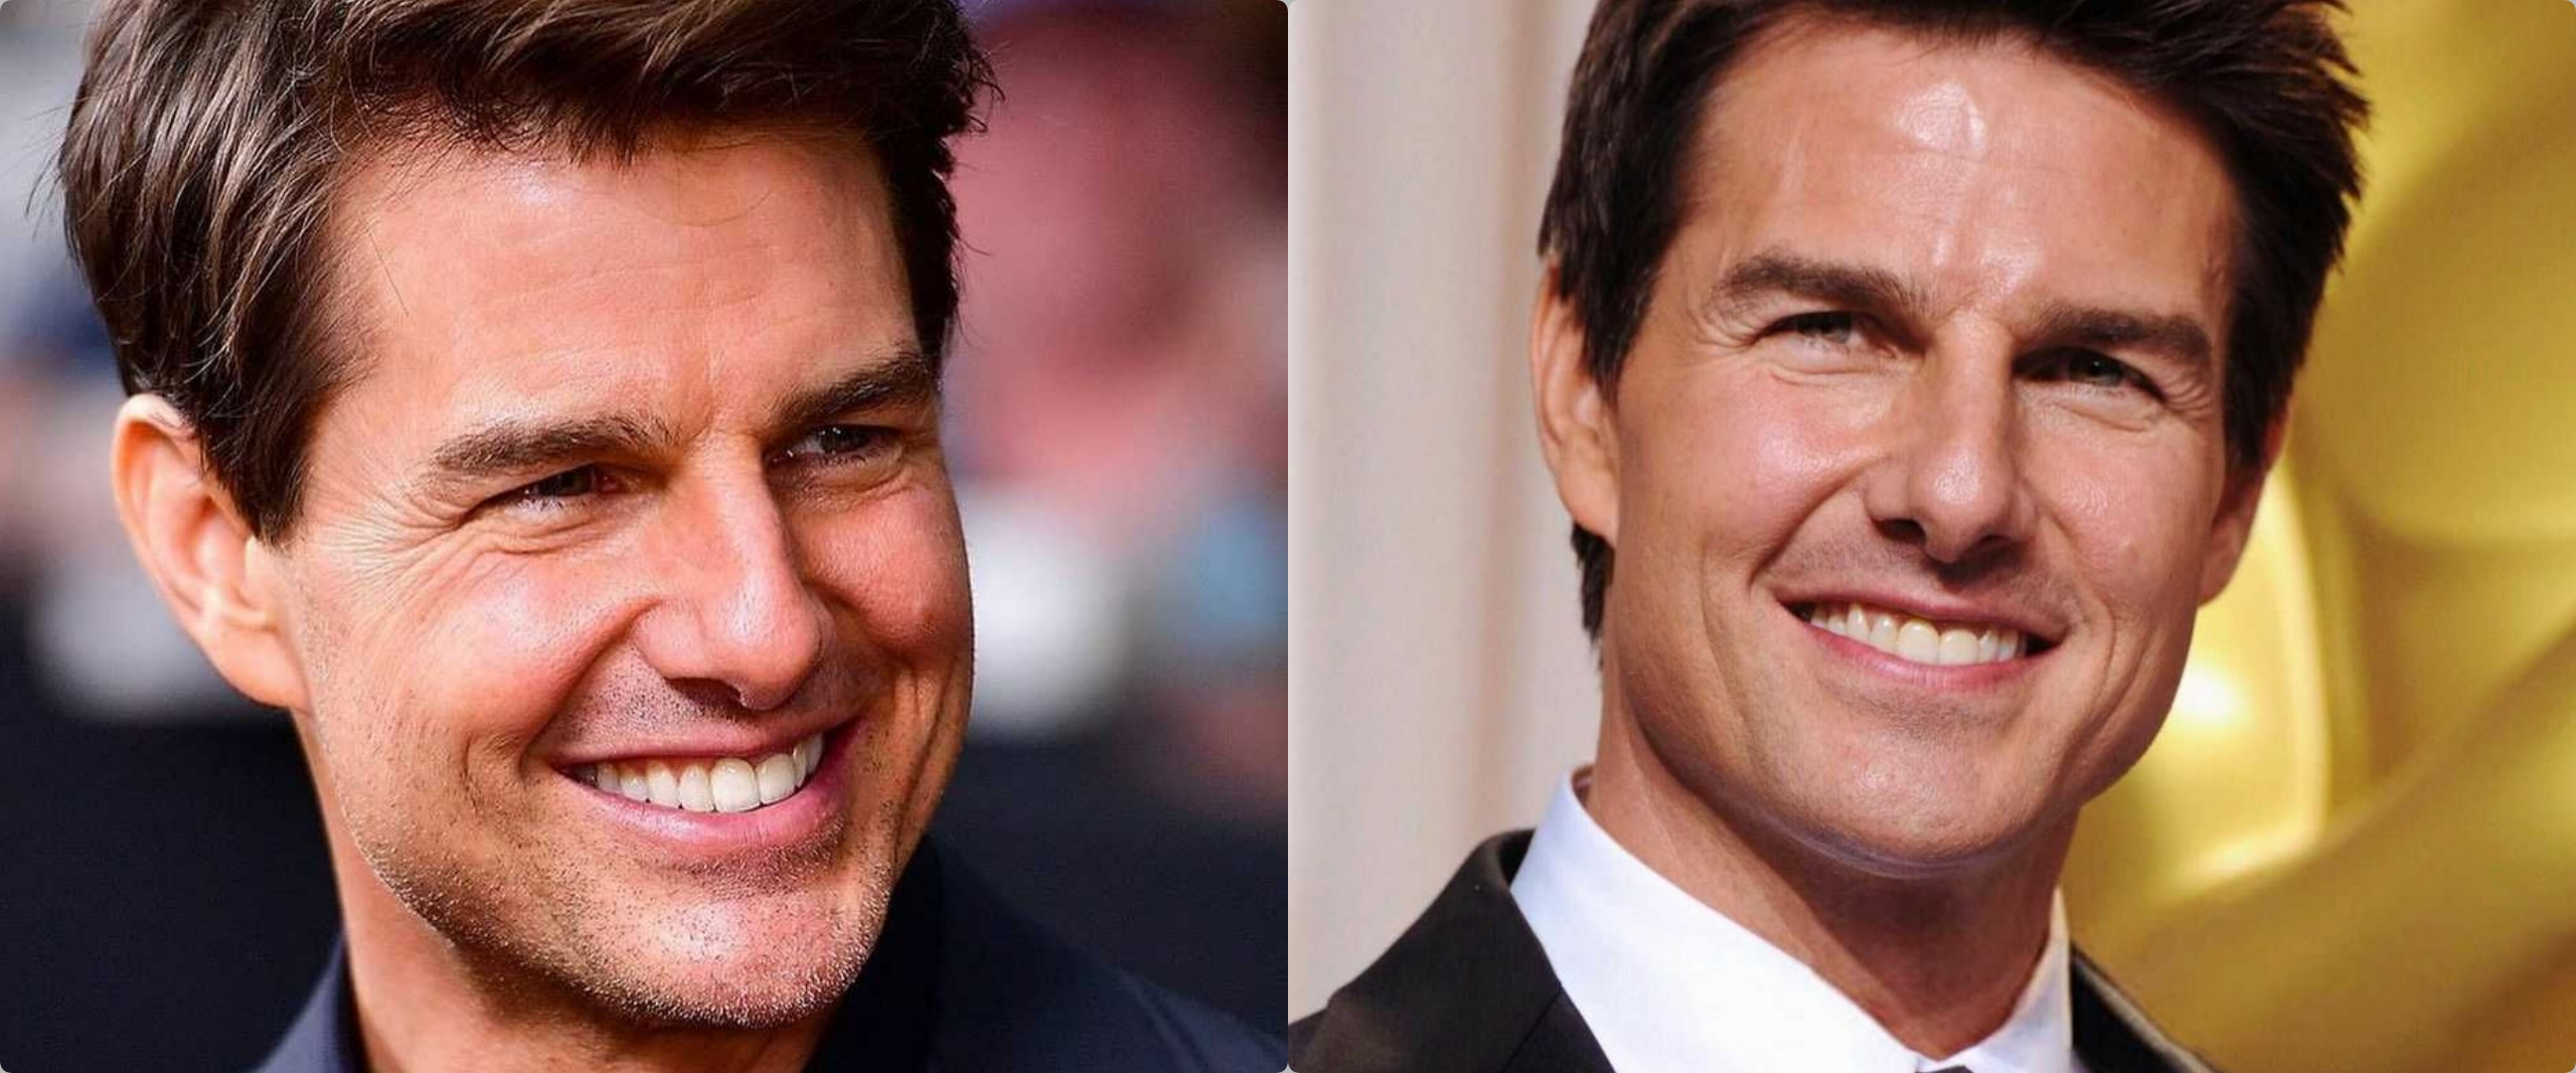 Nyaris tak dikenali, penampilan baru Tom Cruise ini bikin pangling